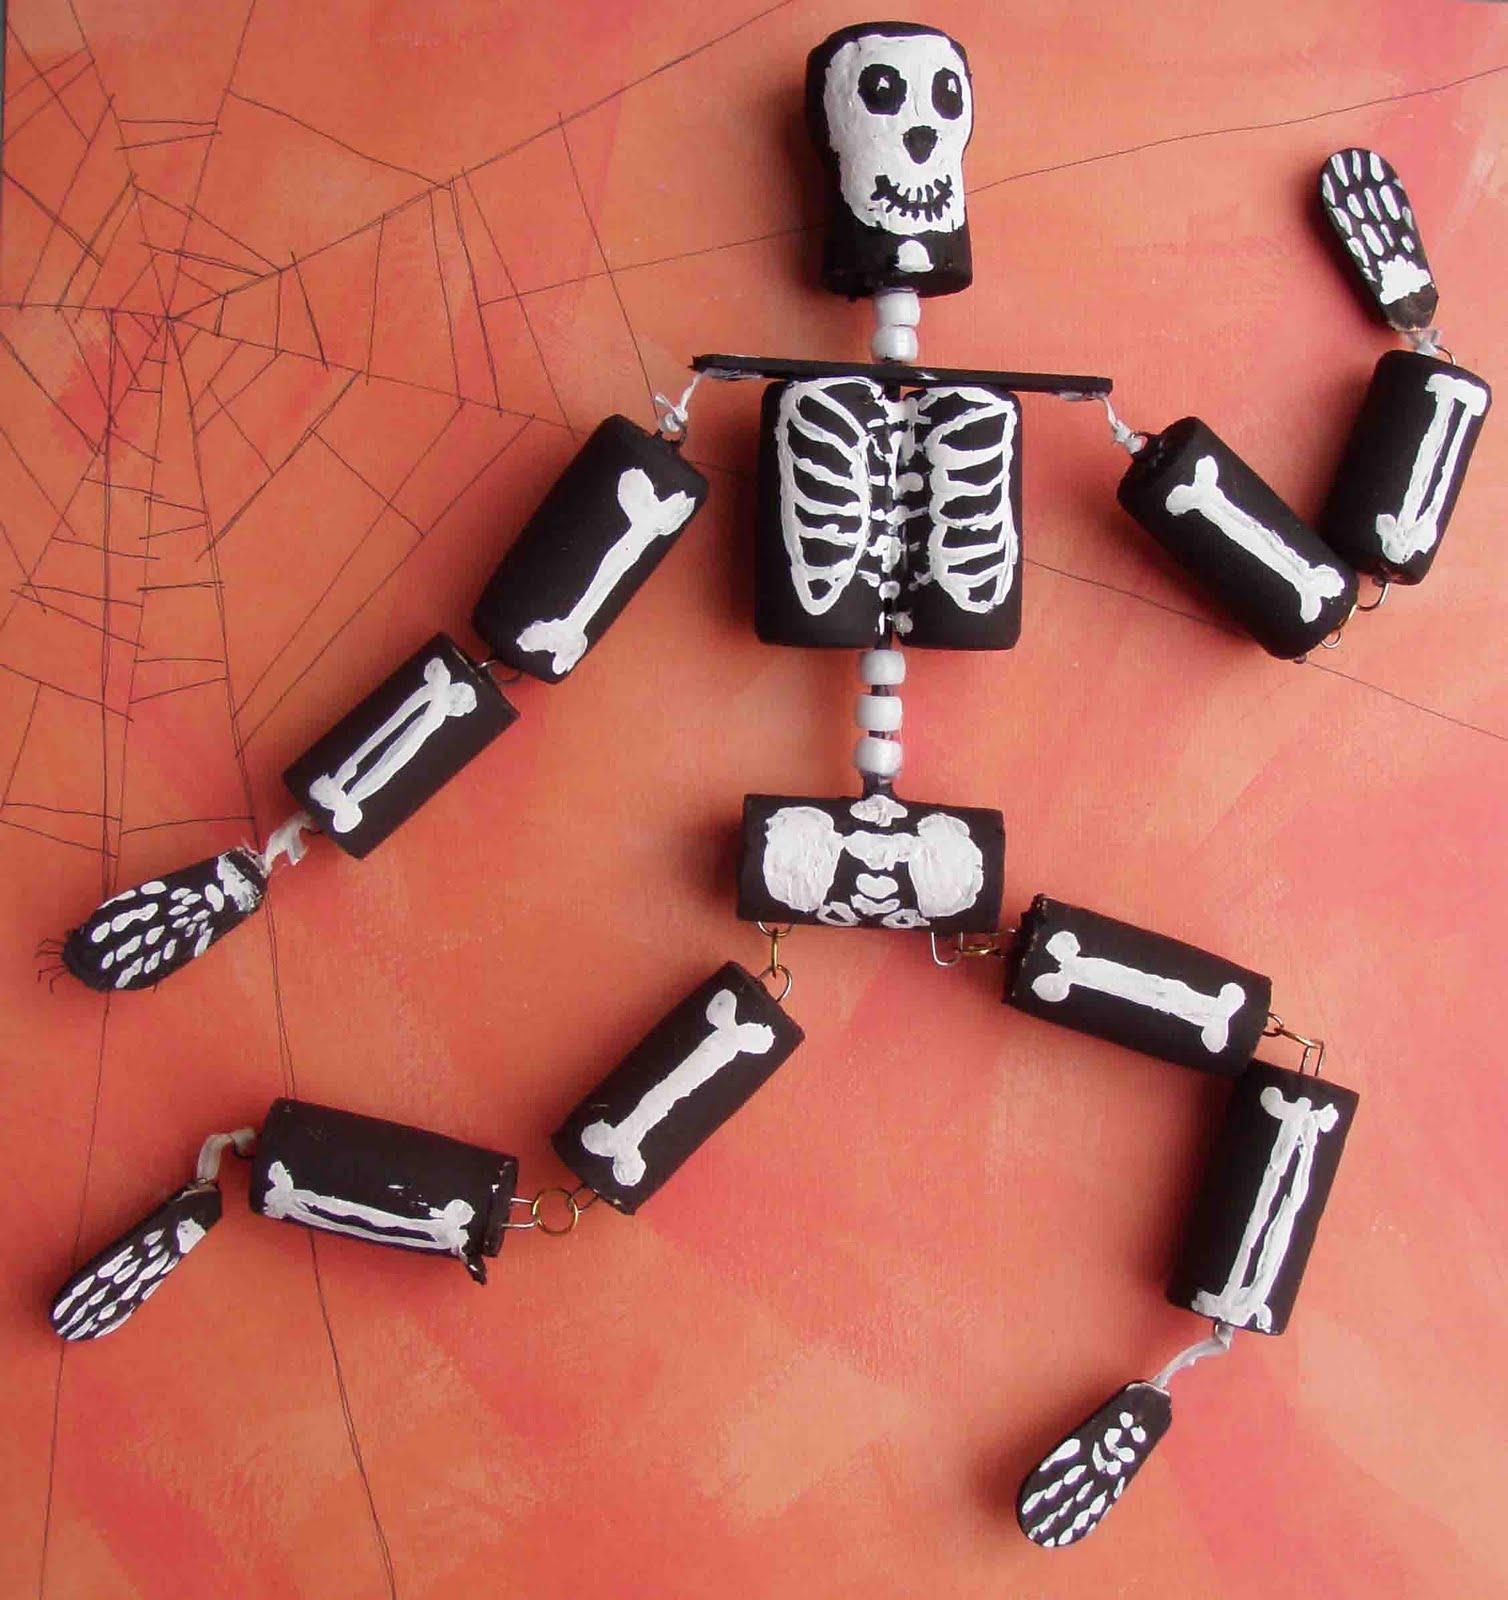 Crack of dawn crafts halloween craft cork skeleton for Kids crafts with wine corks